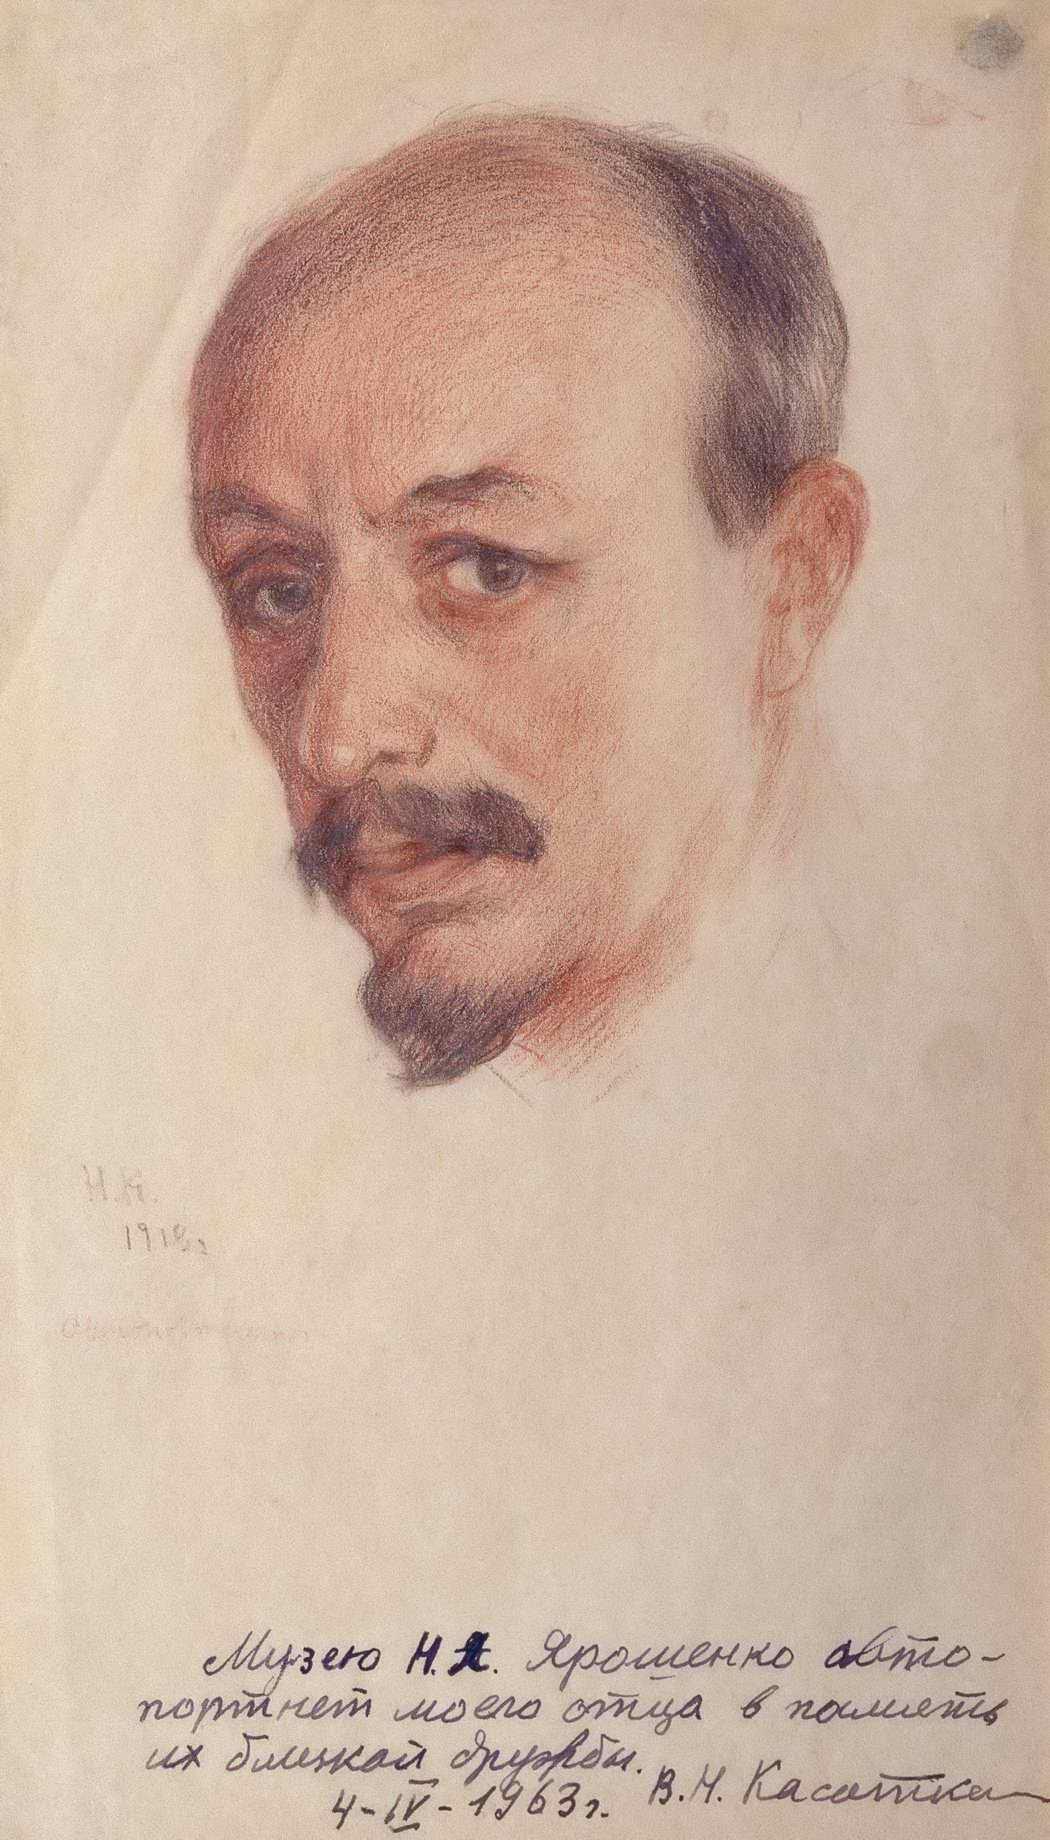 Касаткин Н.А. - Автопортрет